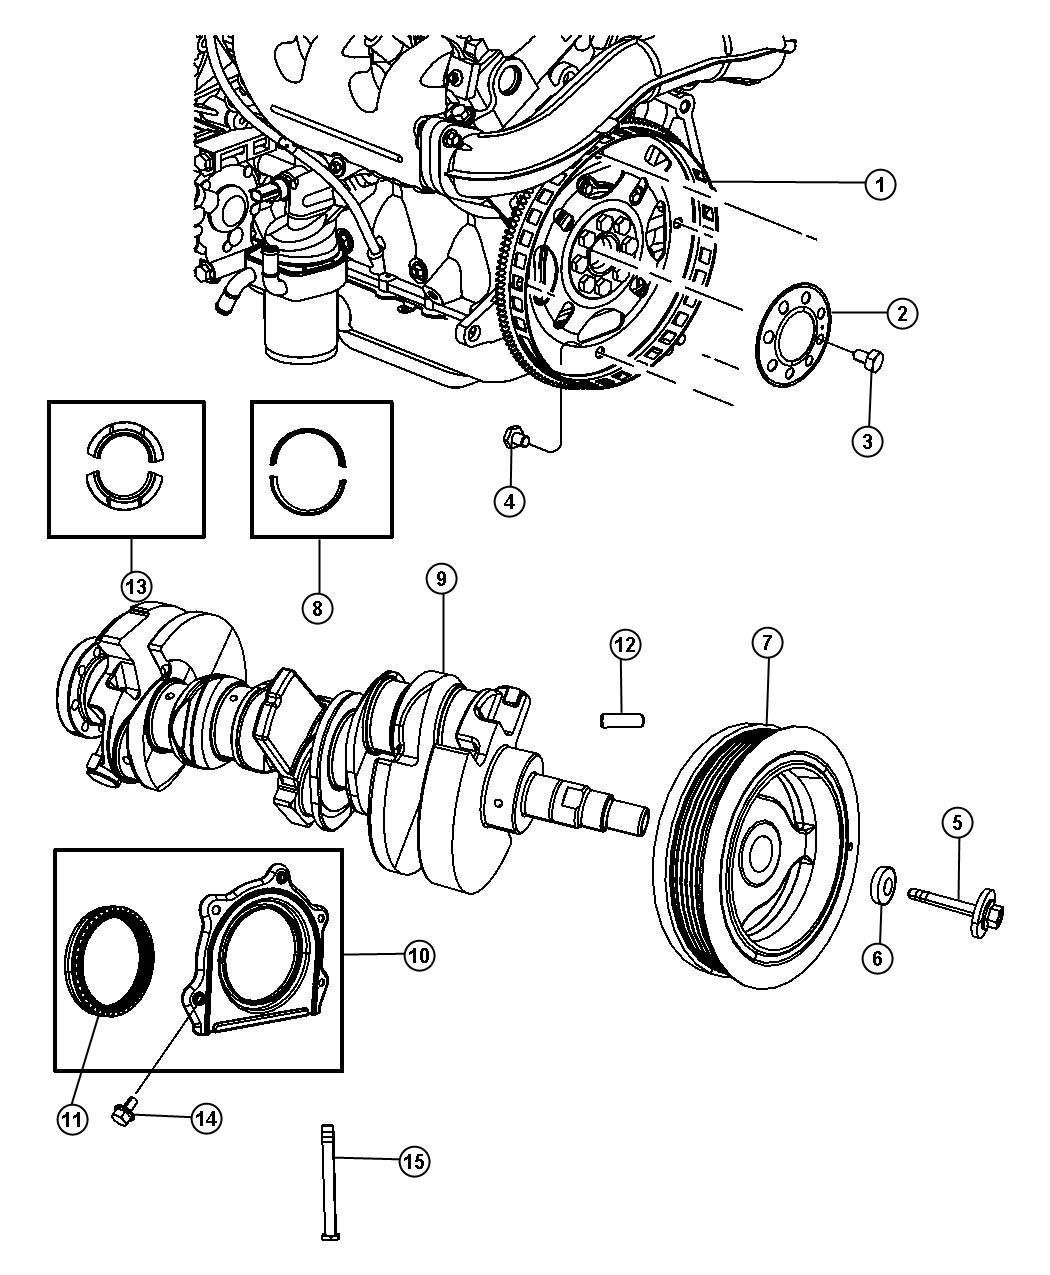 Chrysler Pacifica Crankshaft Crankshaft Bearings Damper